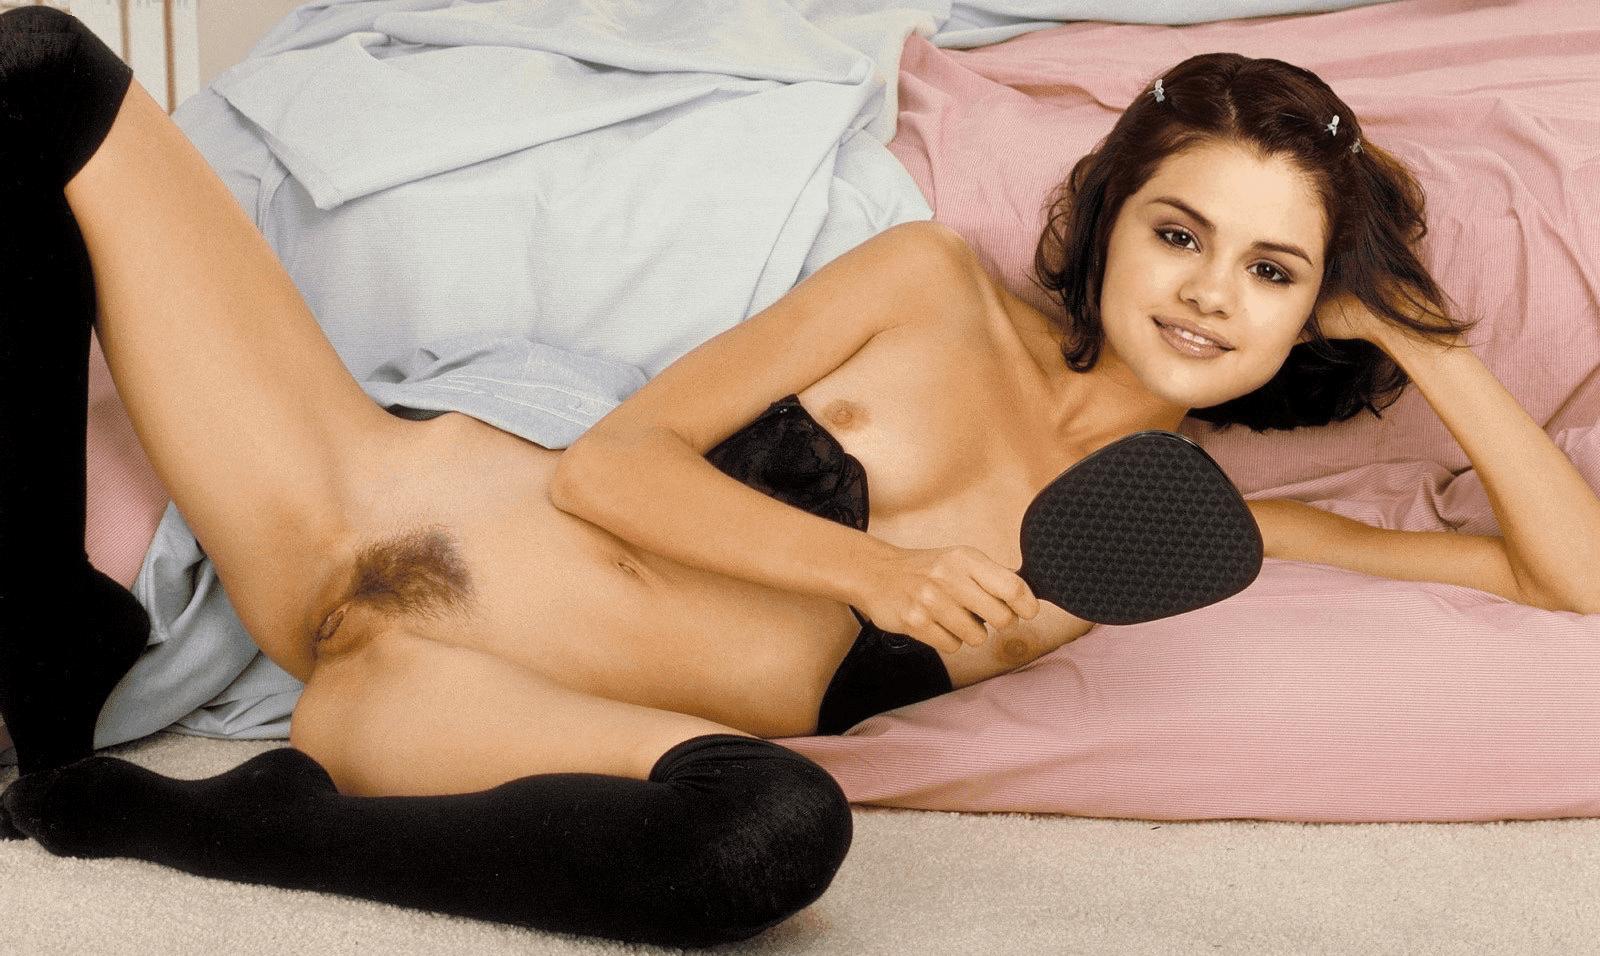 Svart pussyporn